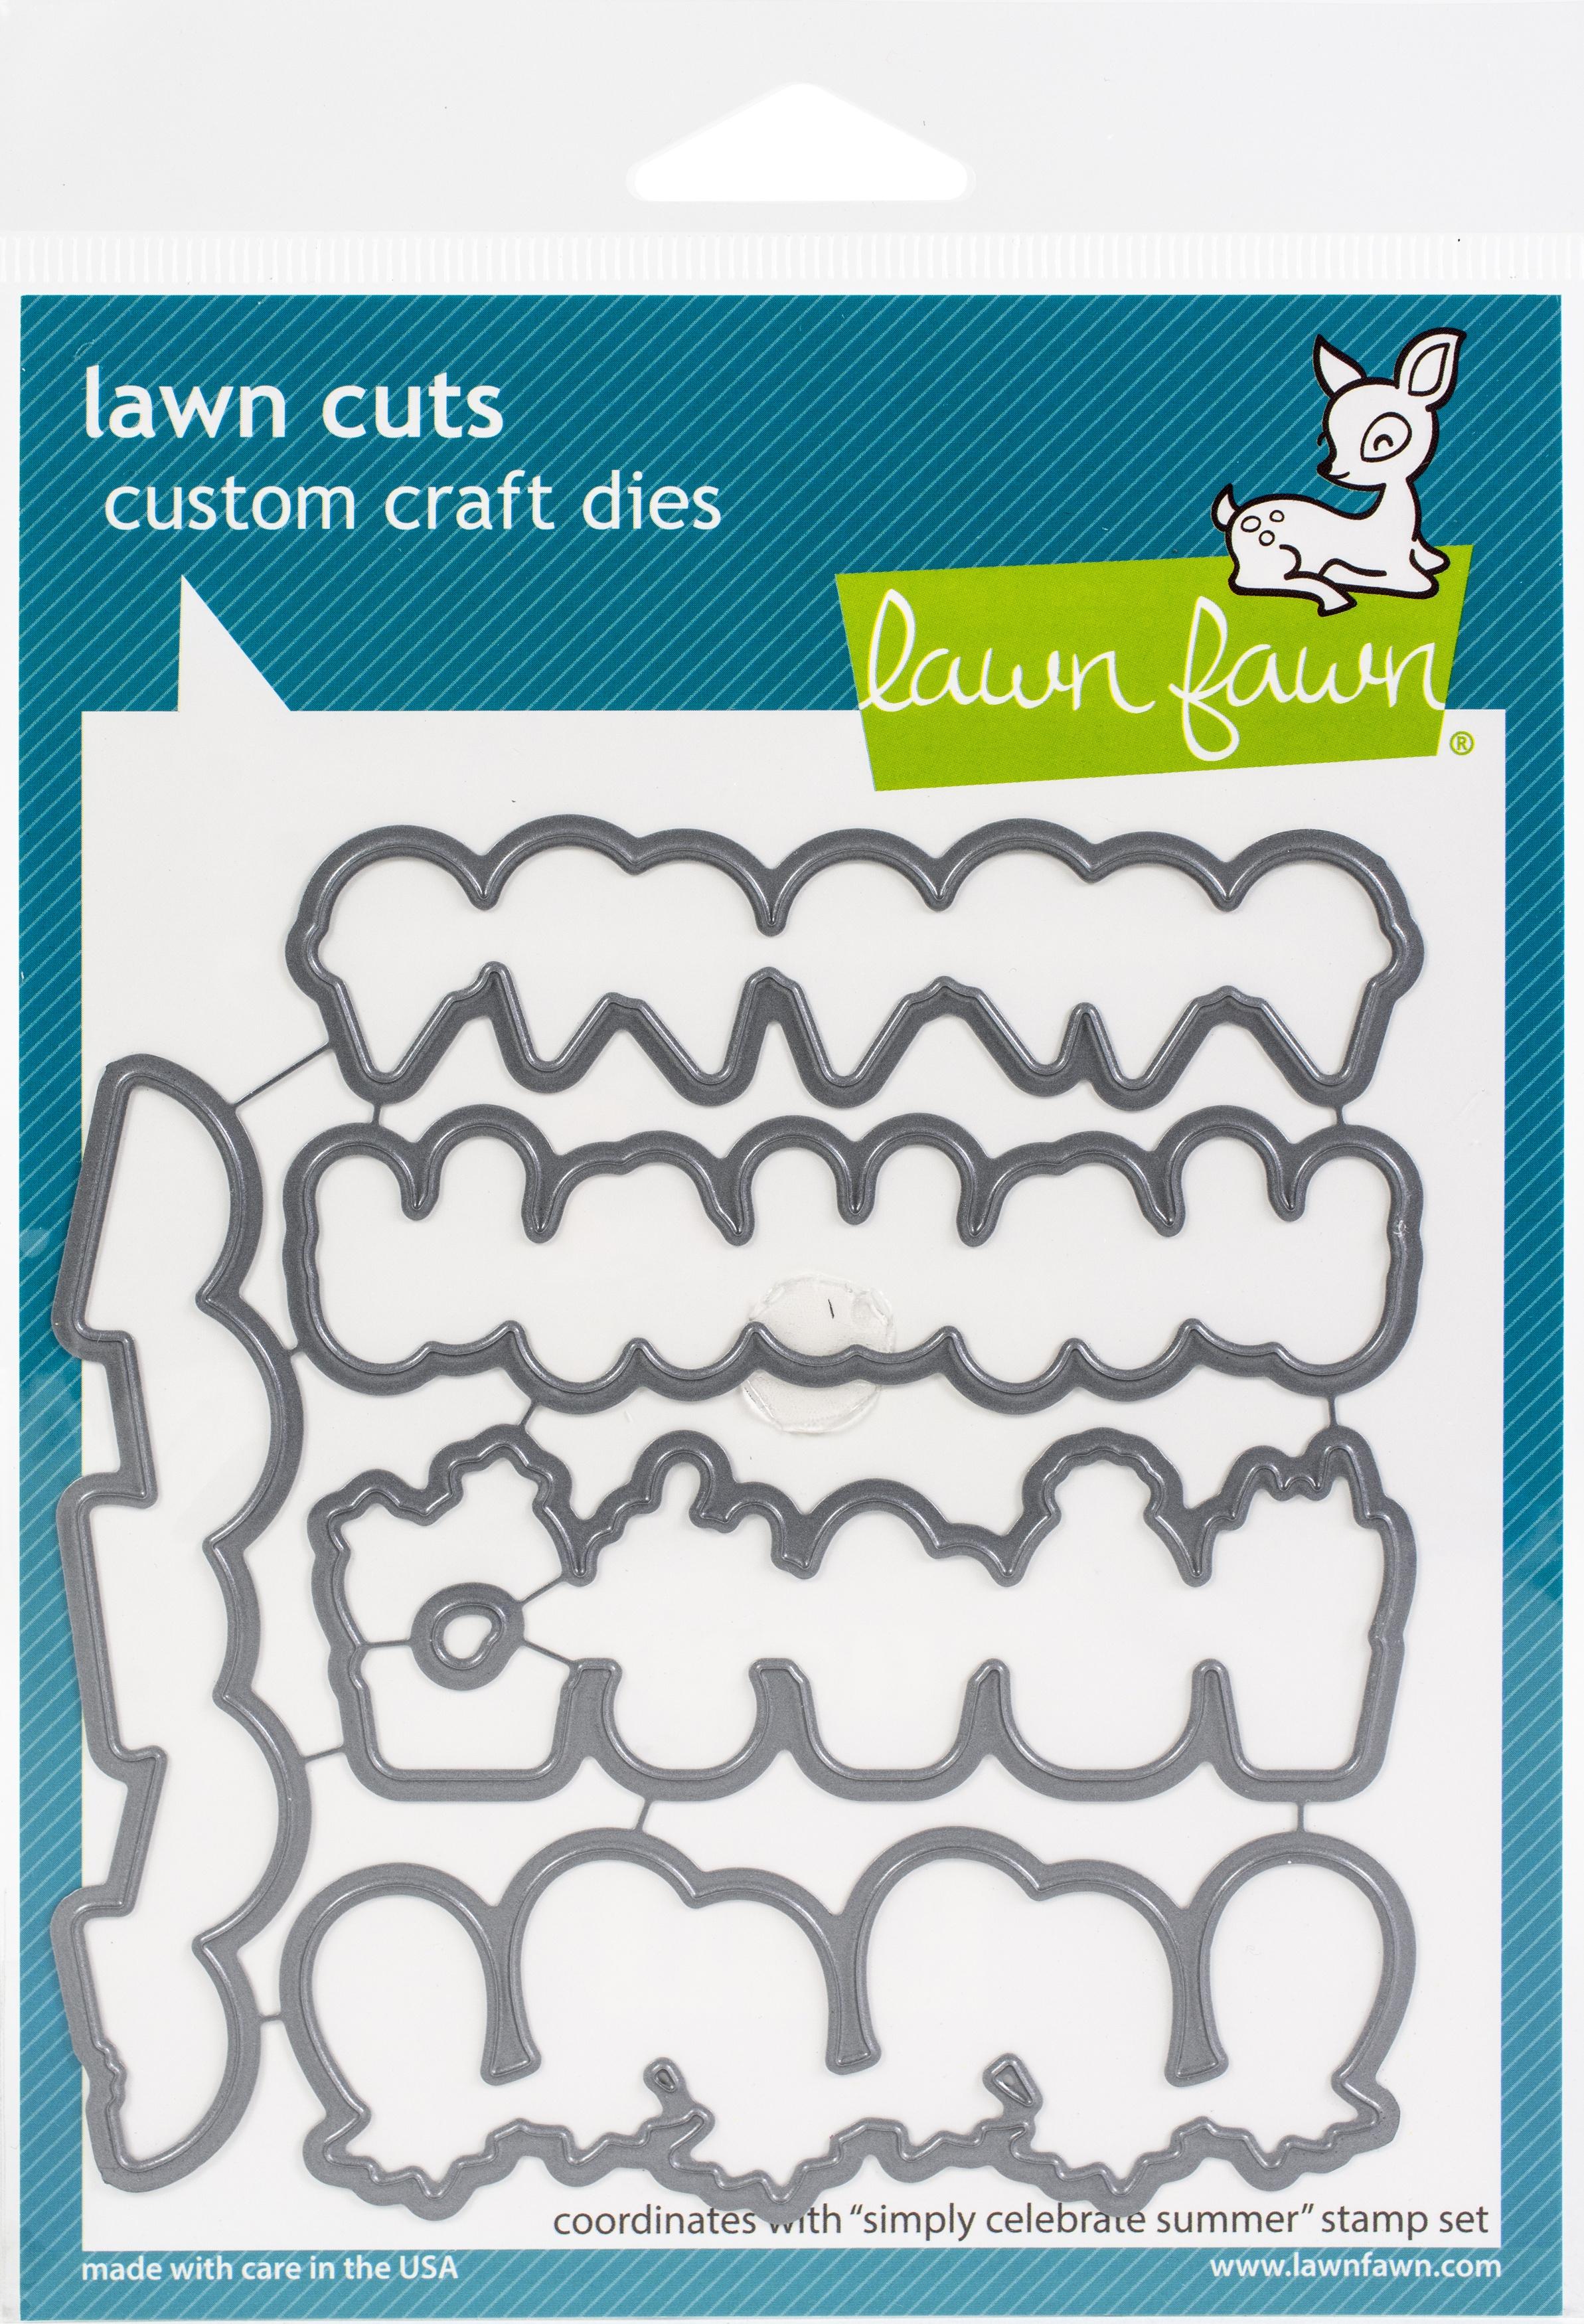 Lawn Cuts Custom Craft Die -Simply Celebrate Summer